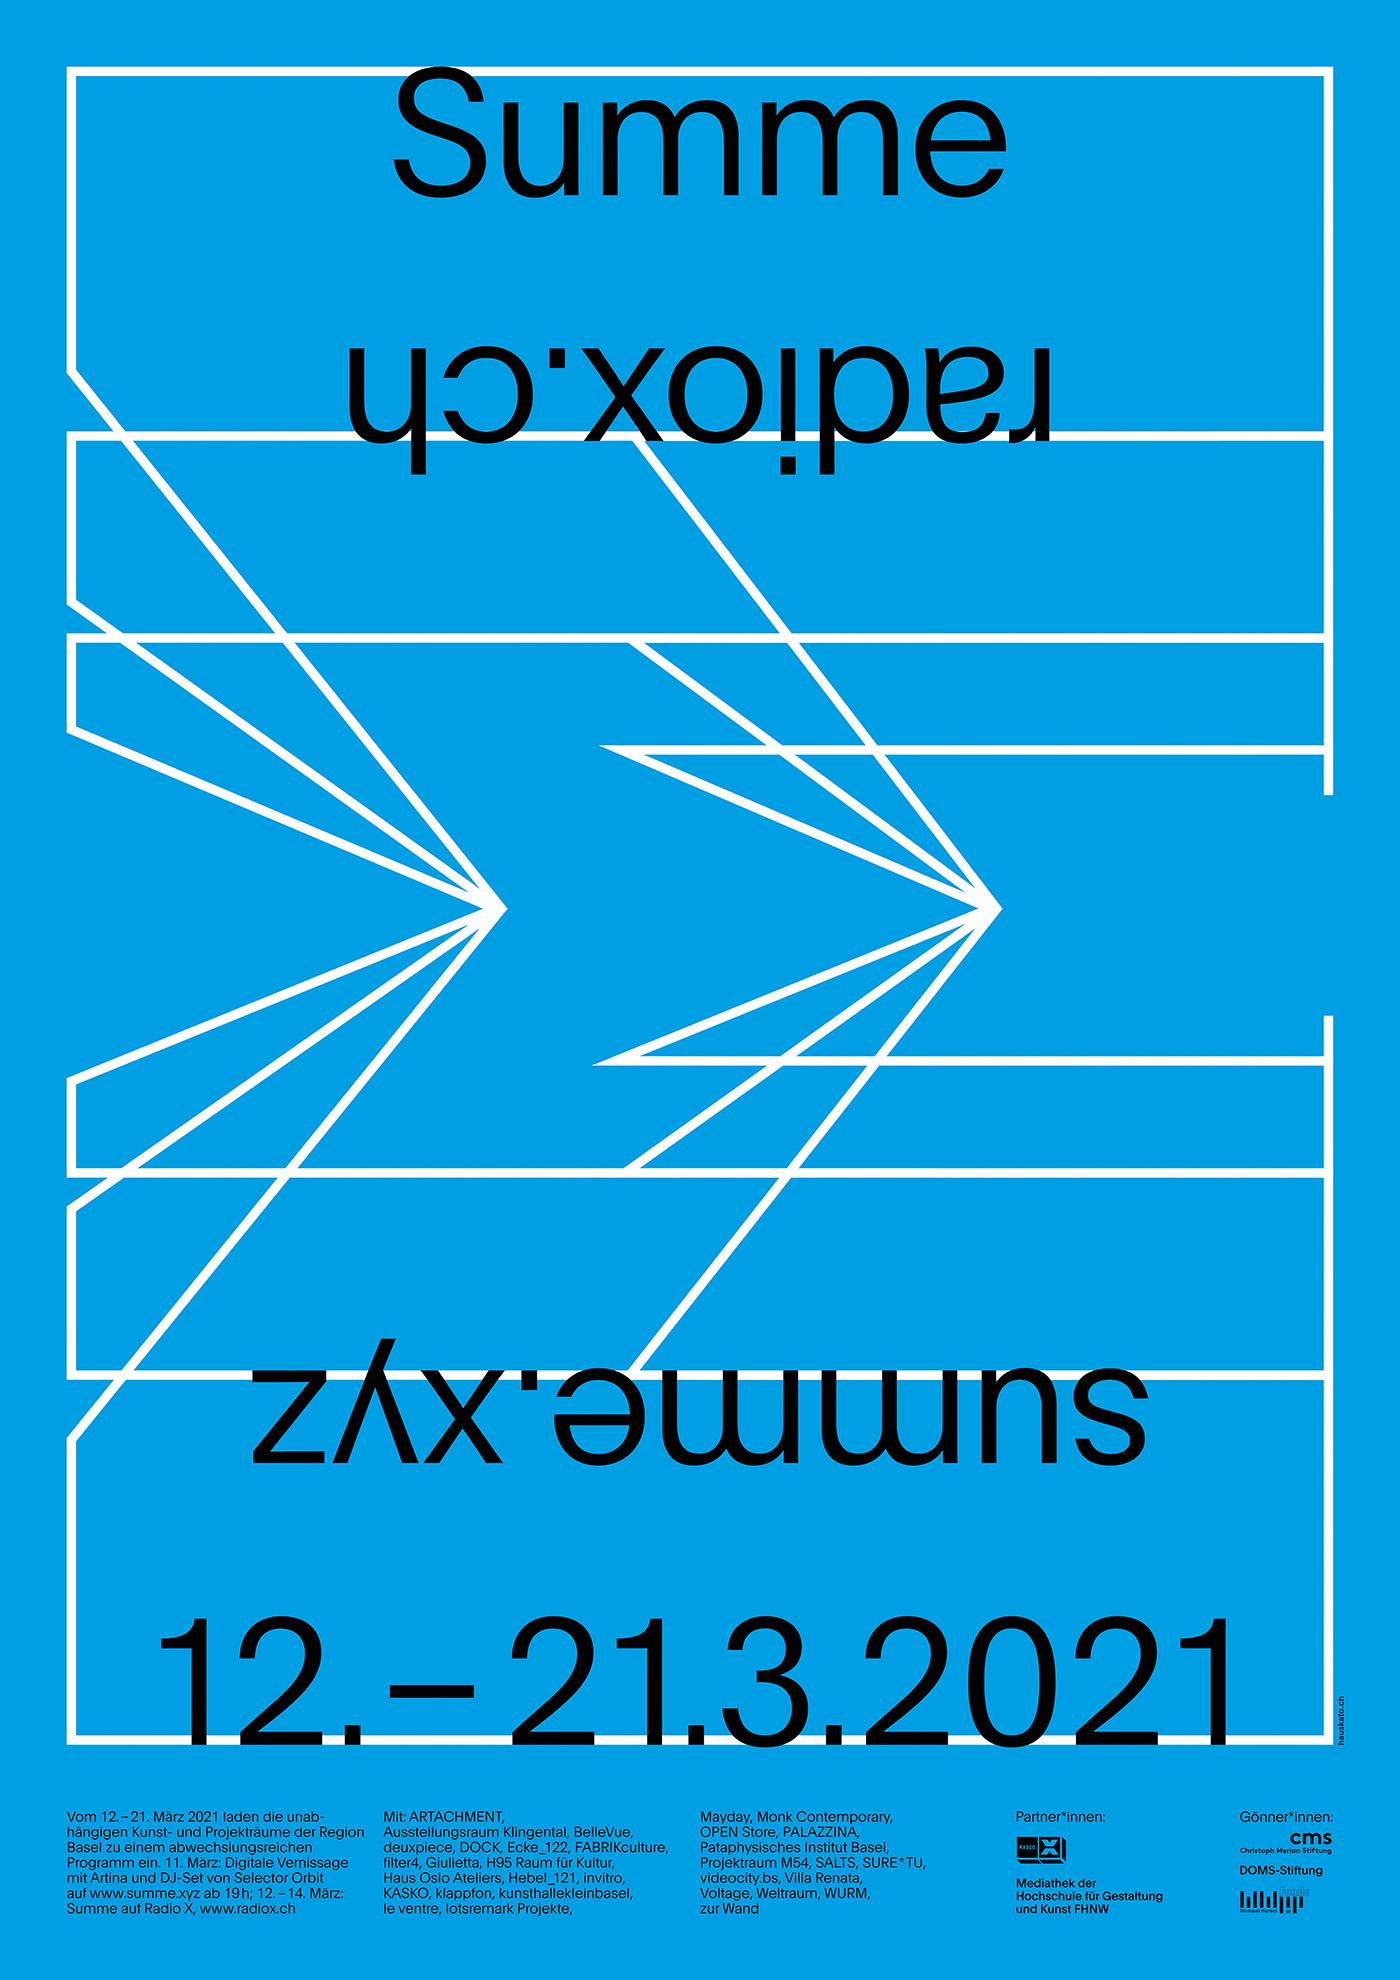 SUMME_2021_Einladung-digital